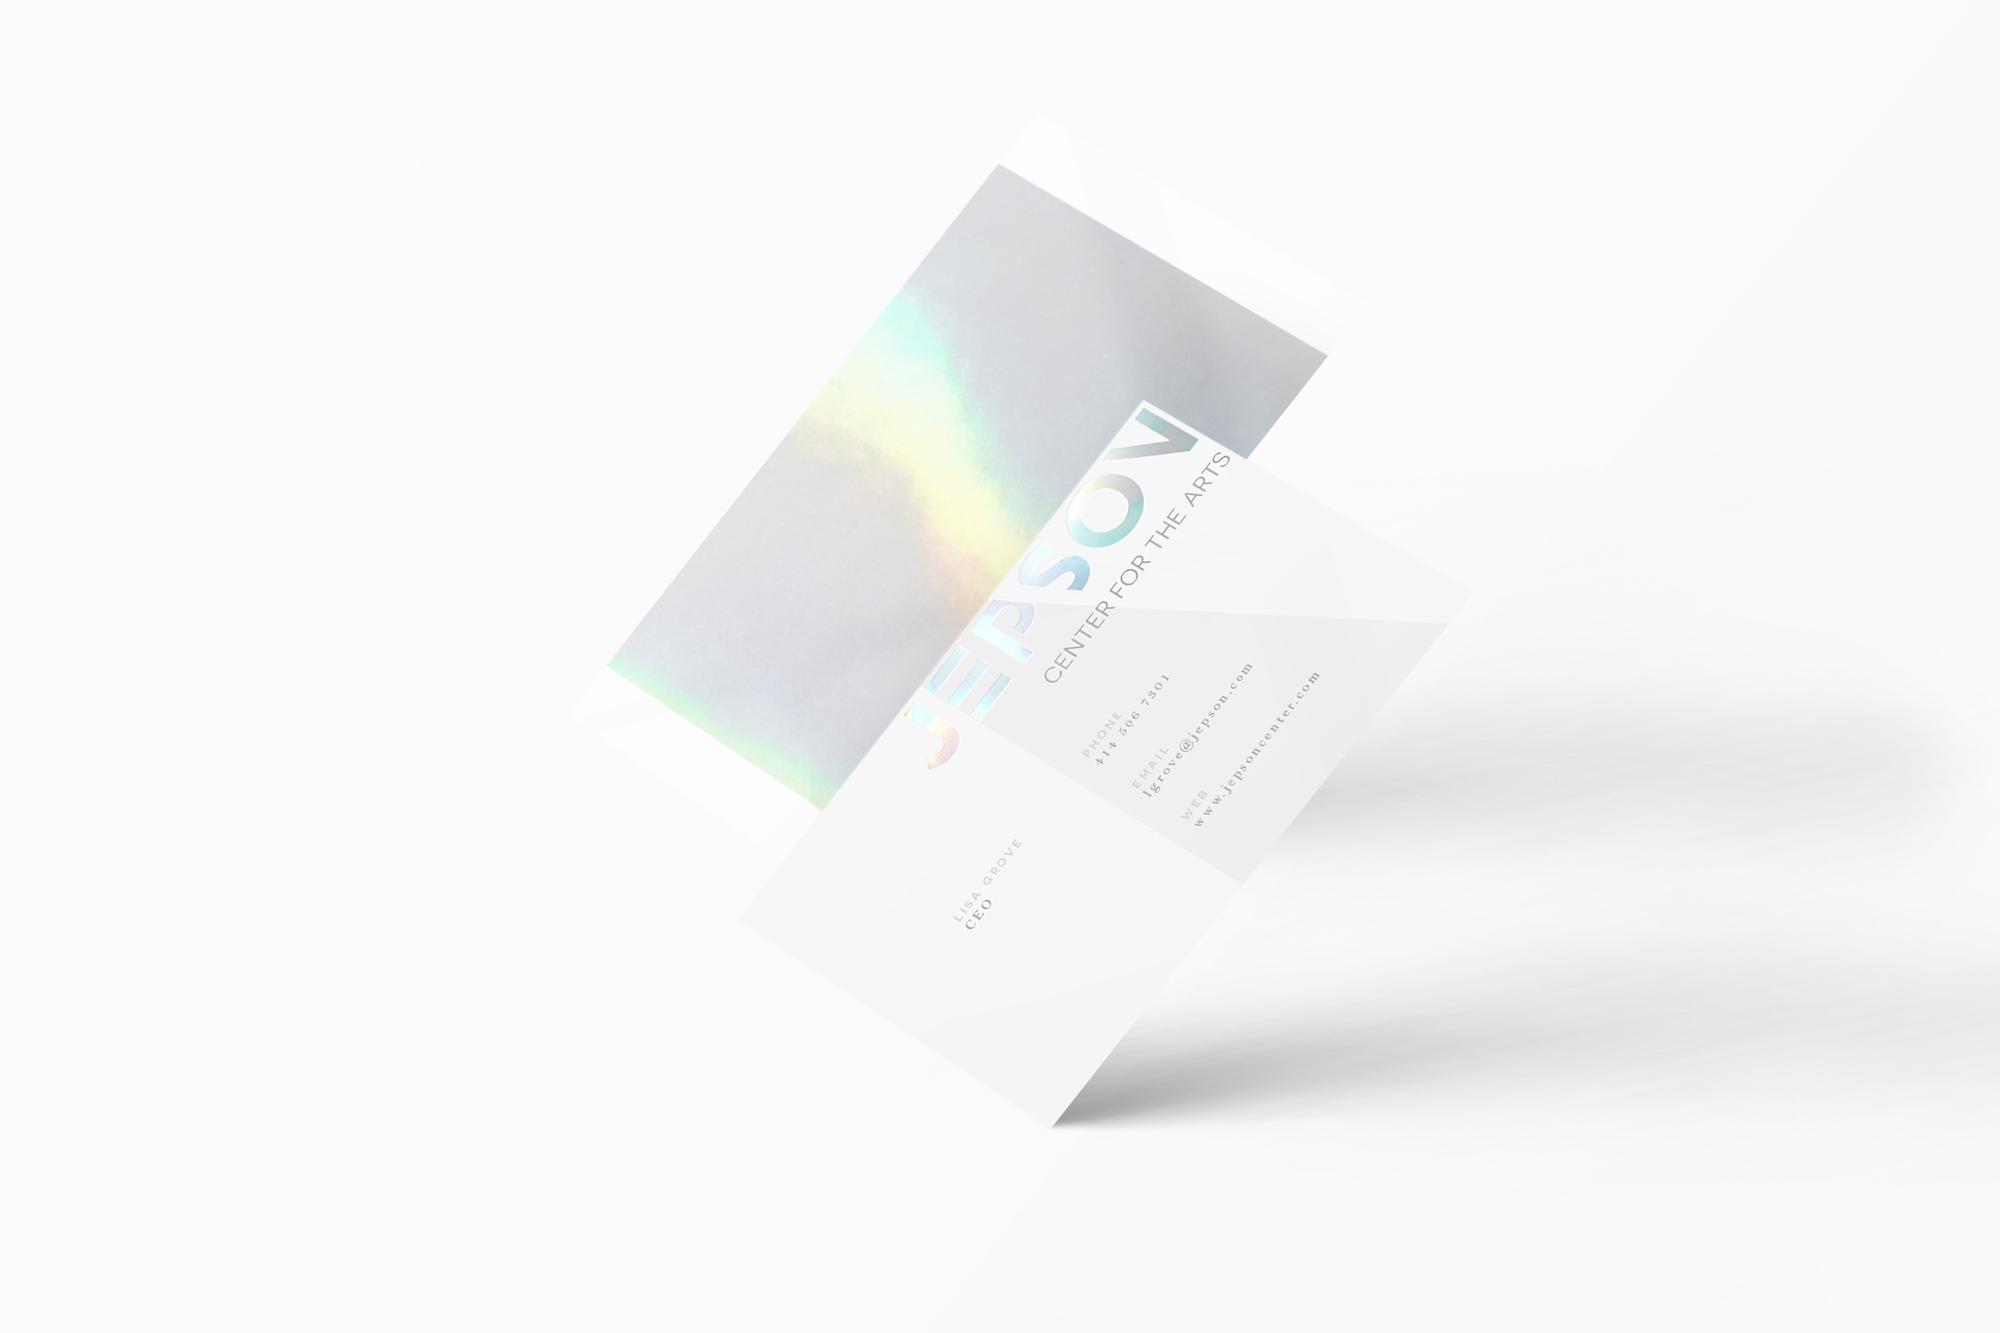 04Business+Card+Mockup+.jpeg